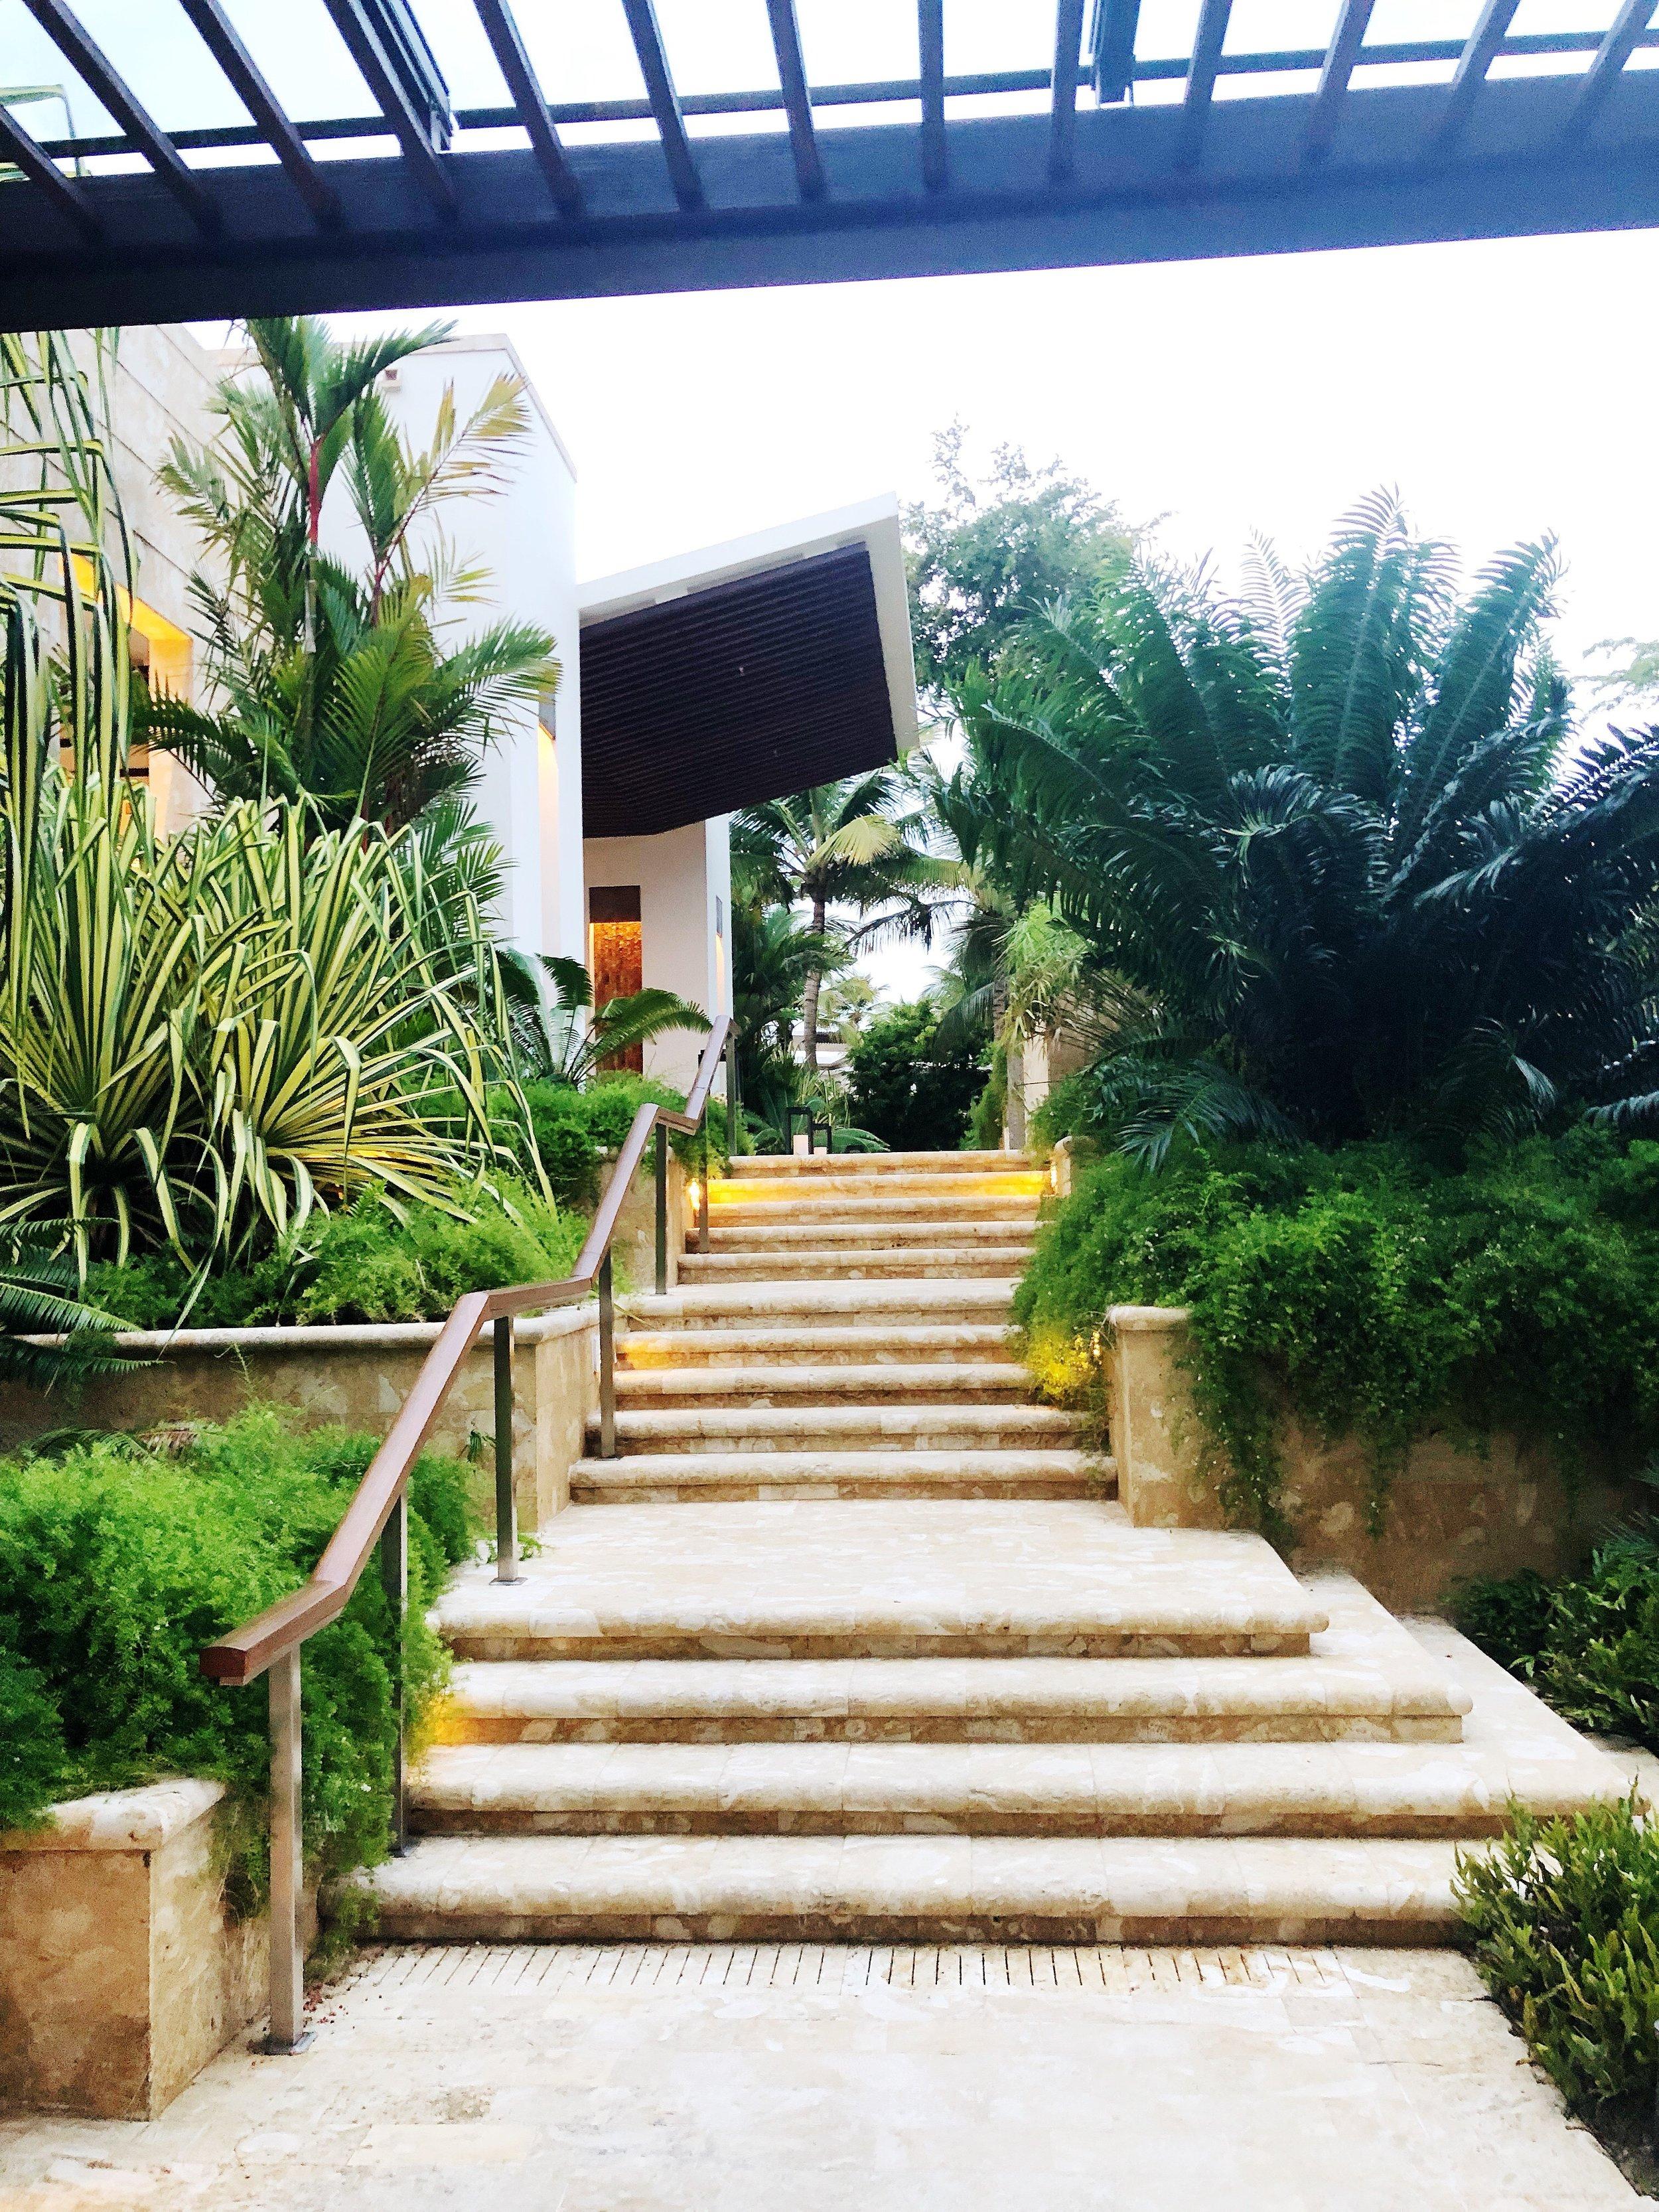 One of the main entry ways at the Dorado Beach Ritz Carlton Reserve.